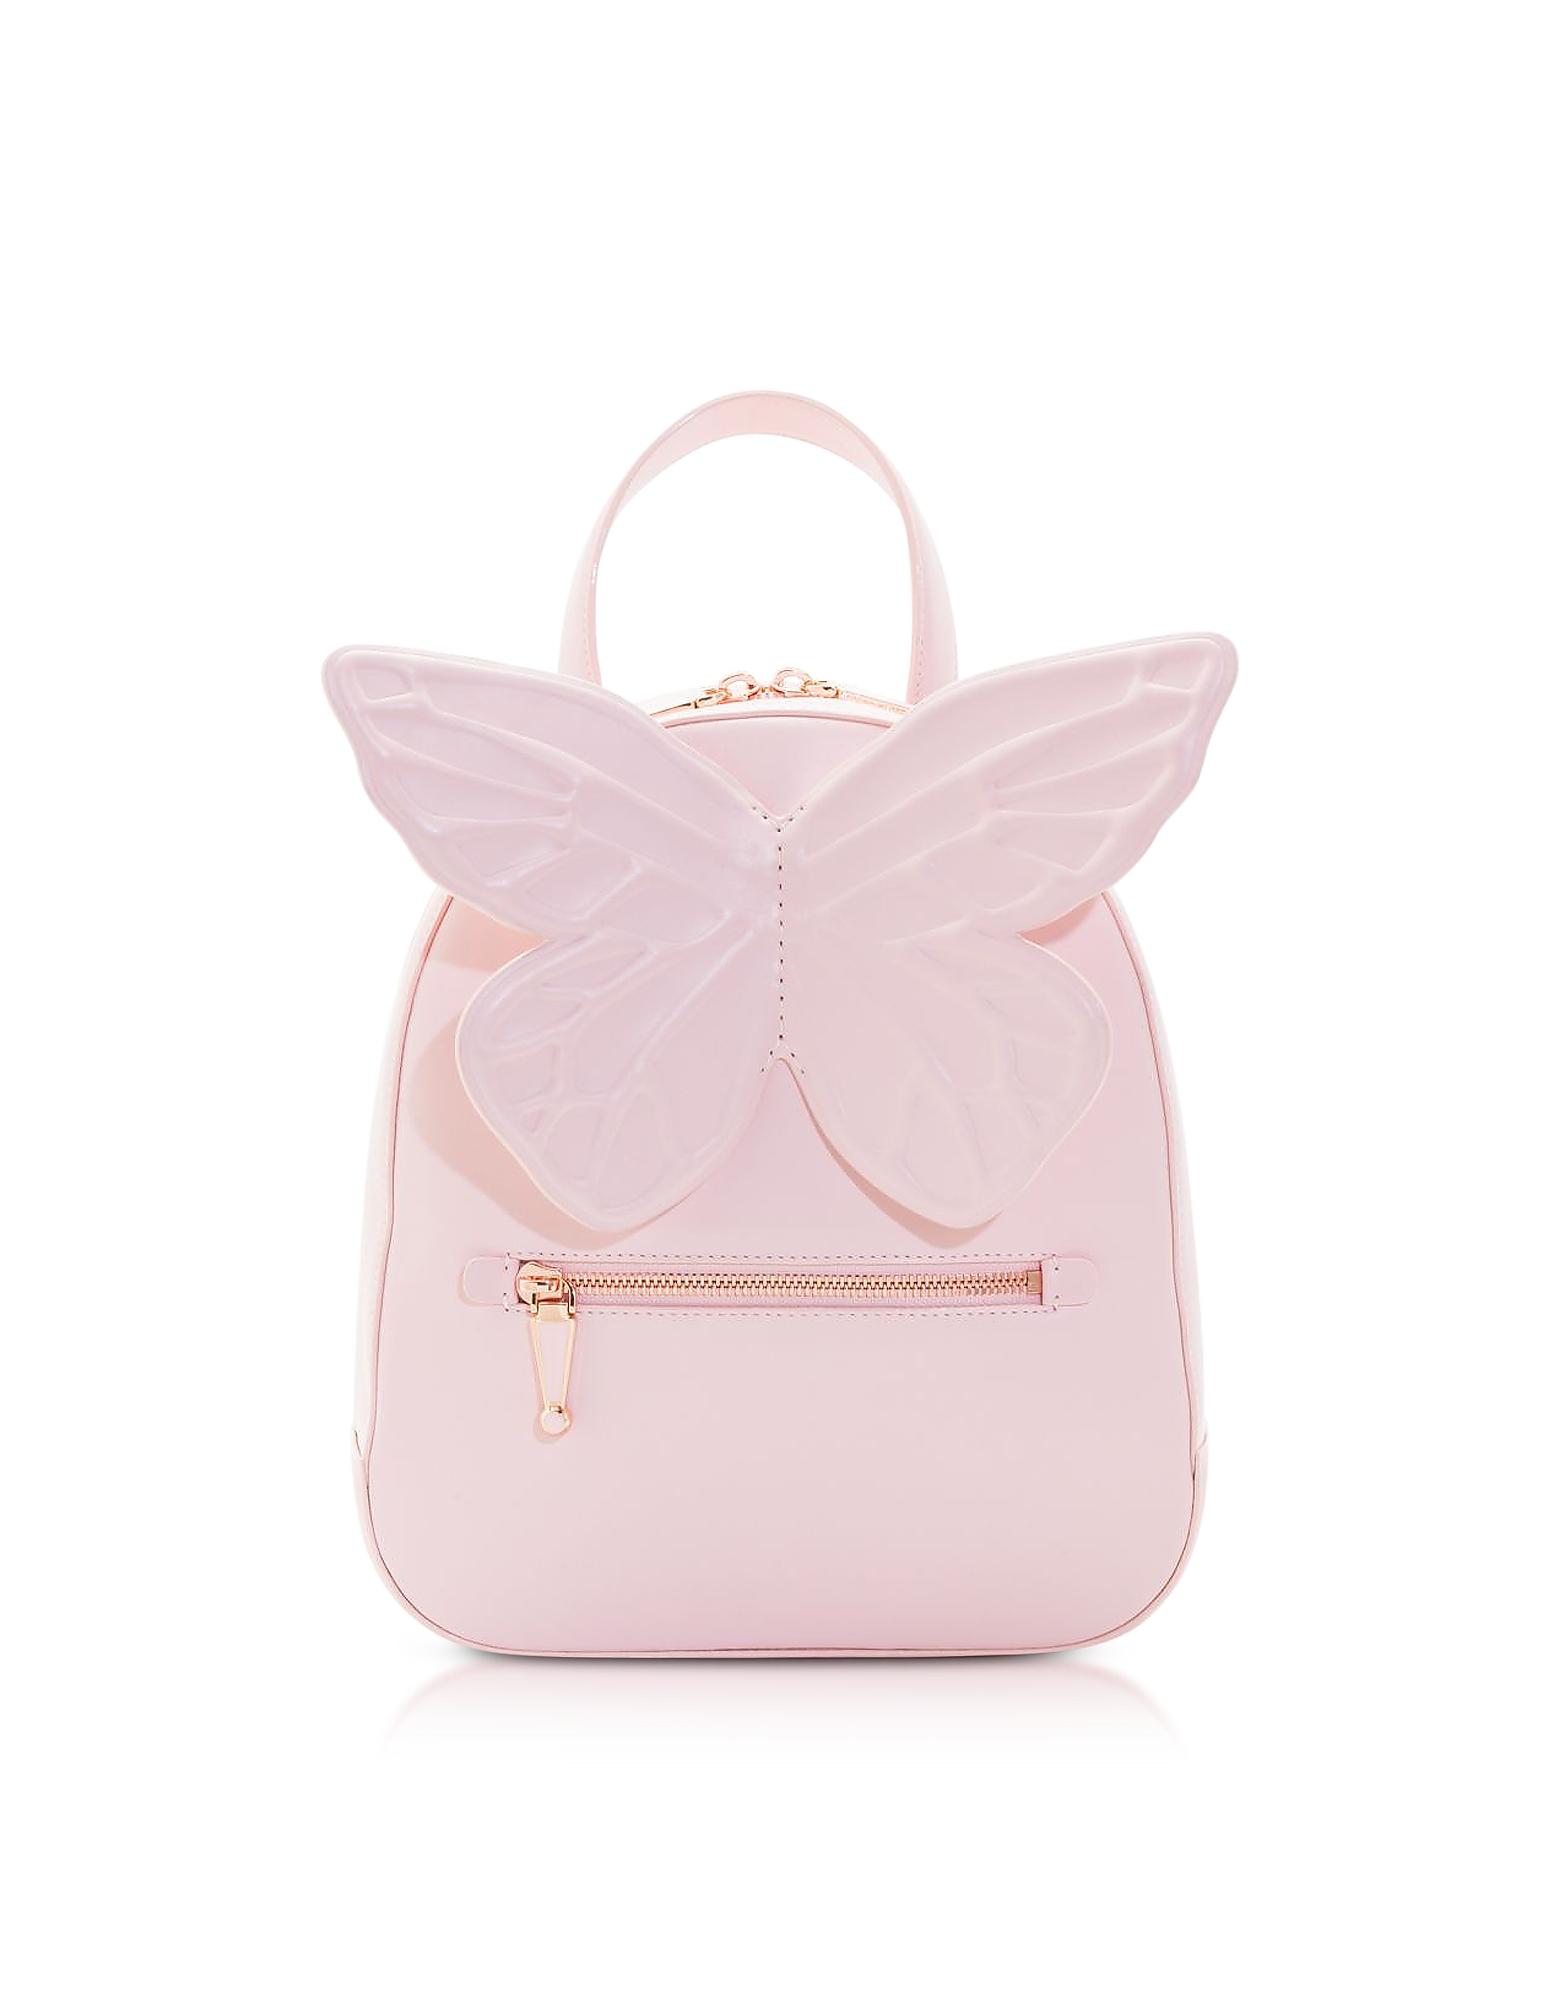 Sophia Webster Handbags, Baby Pink Kiko Butterfly Backpack